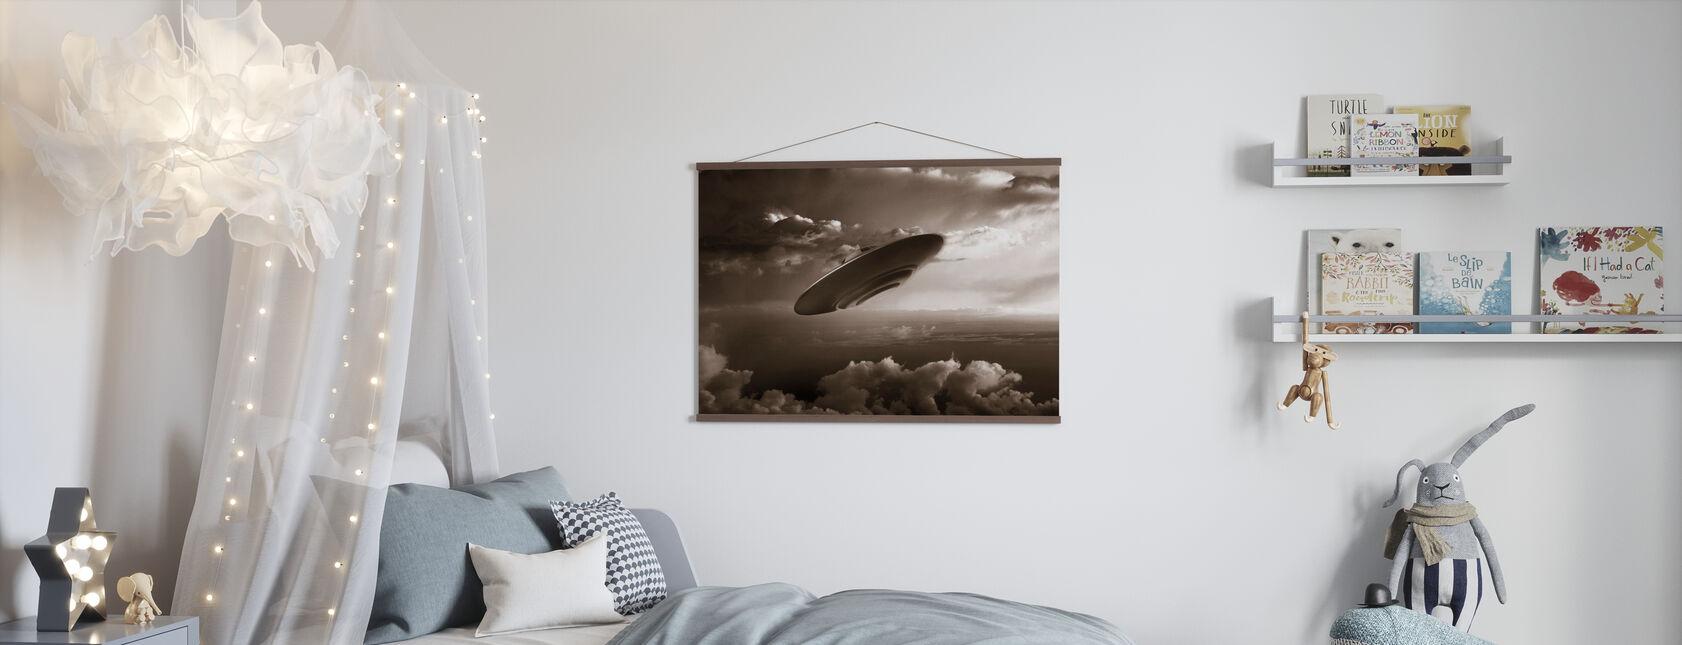 Ufo - Sepia - Juliste - Lastenhuone